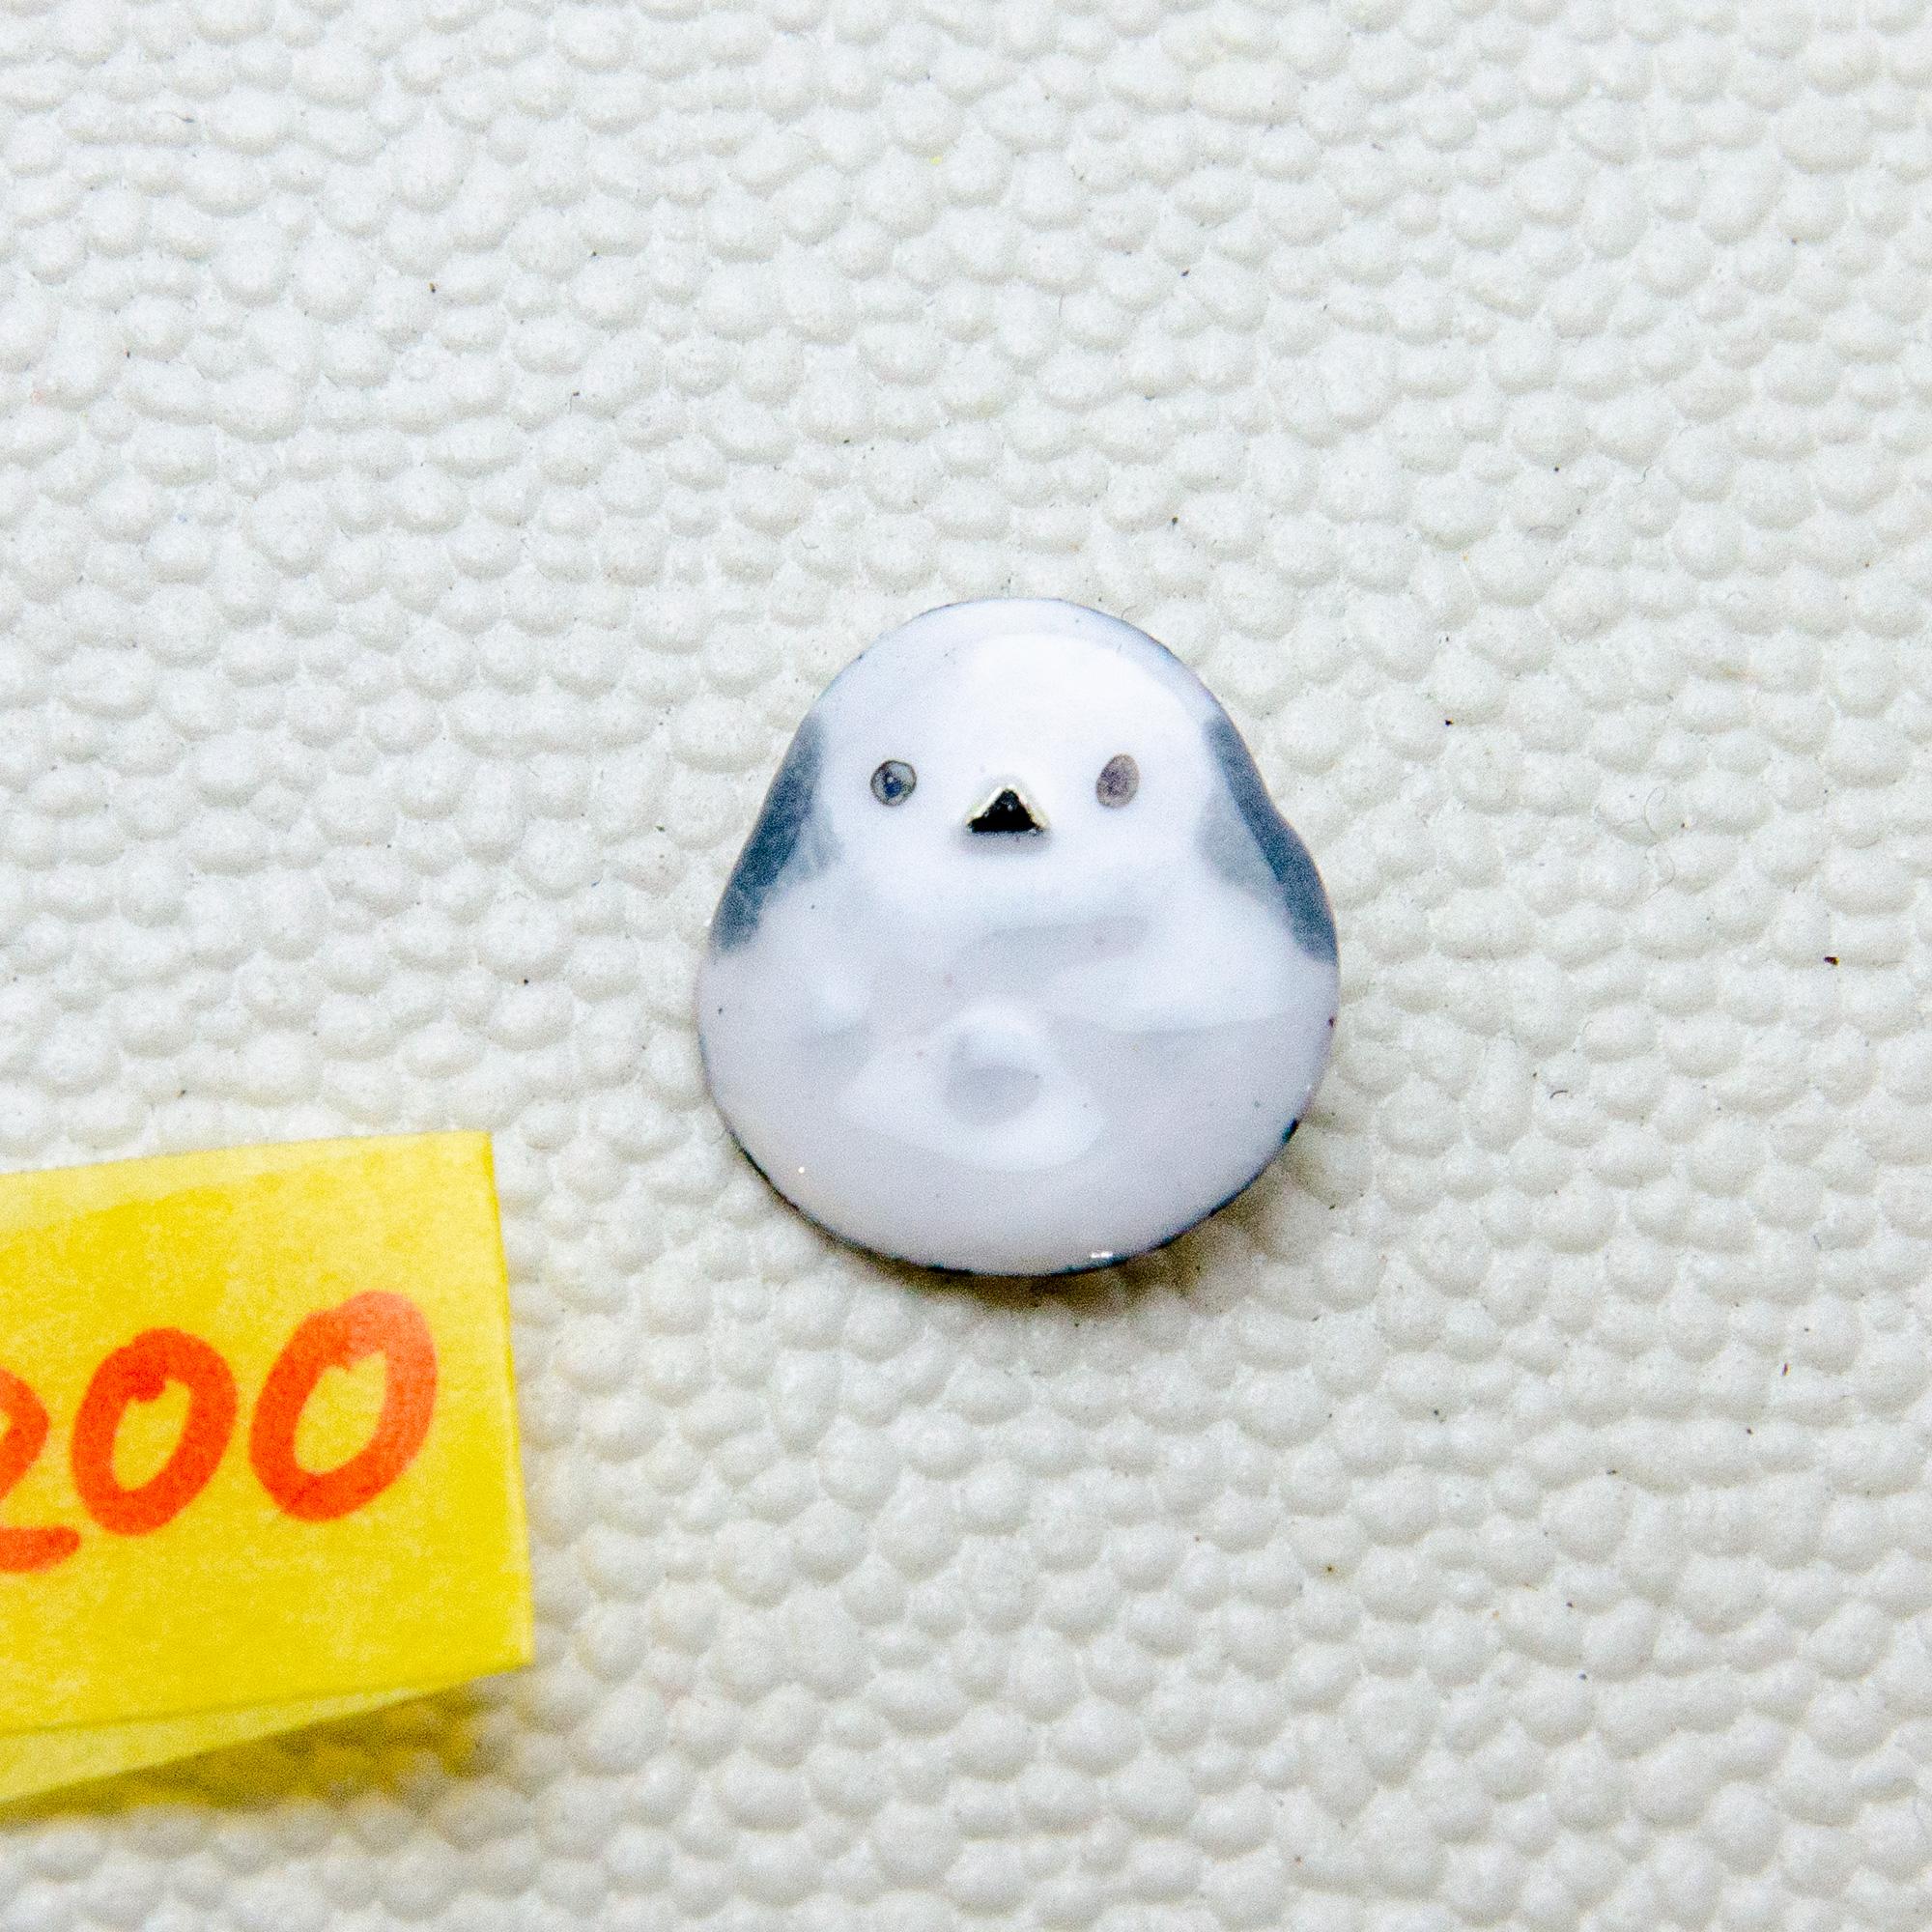 200422-200